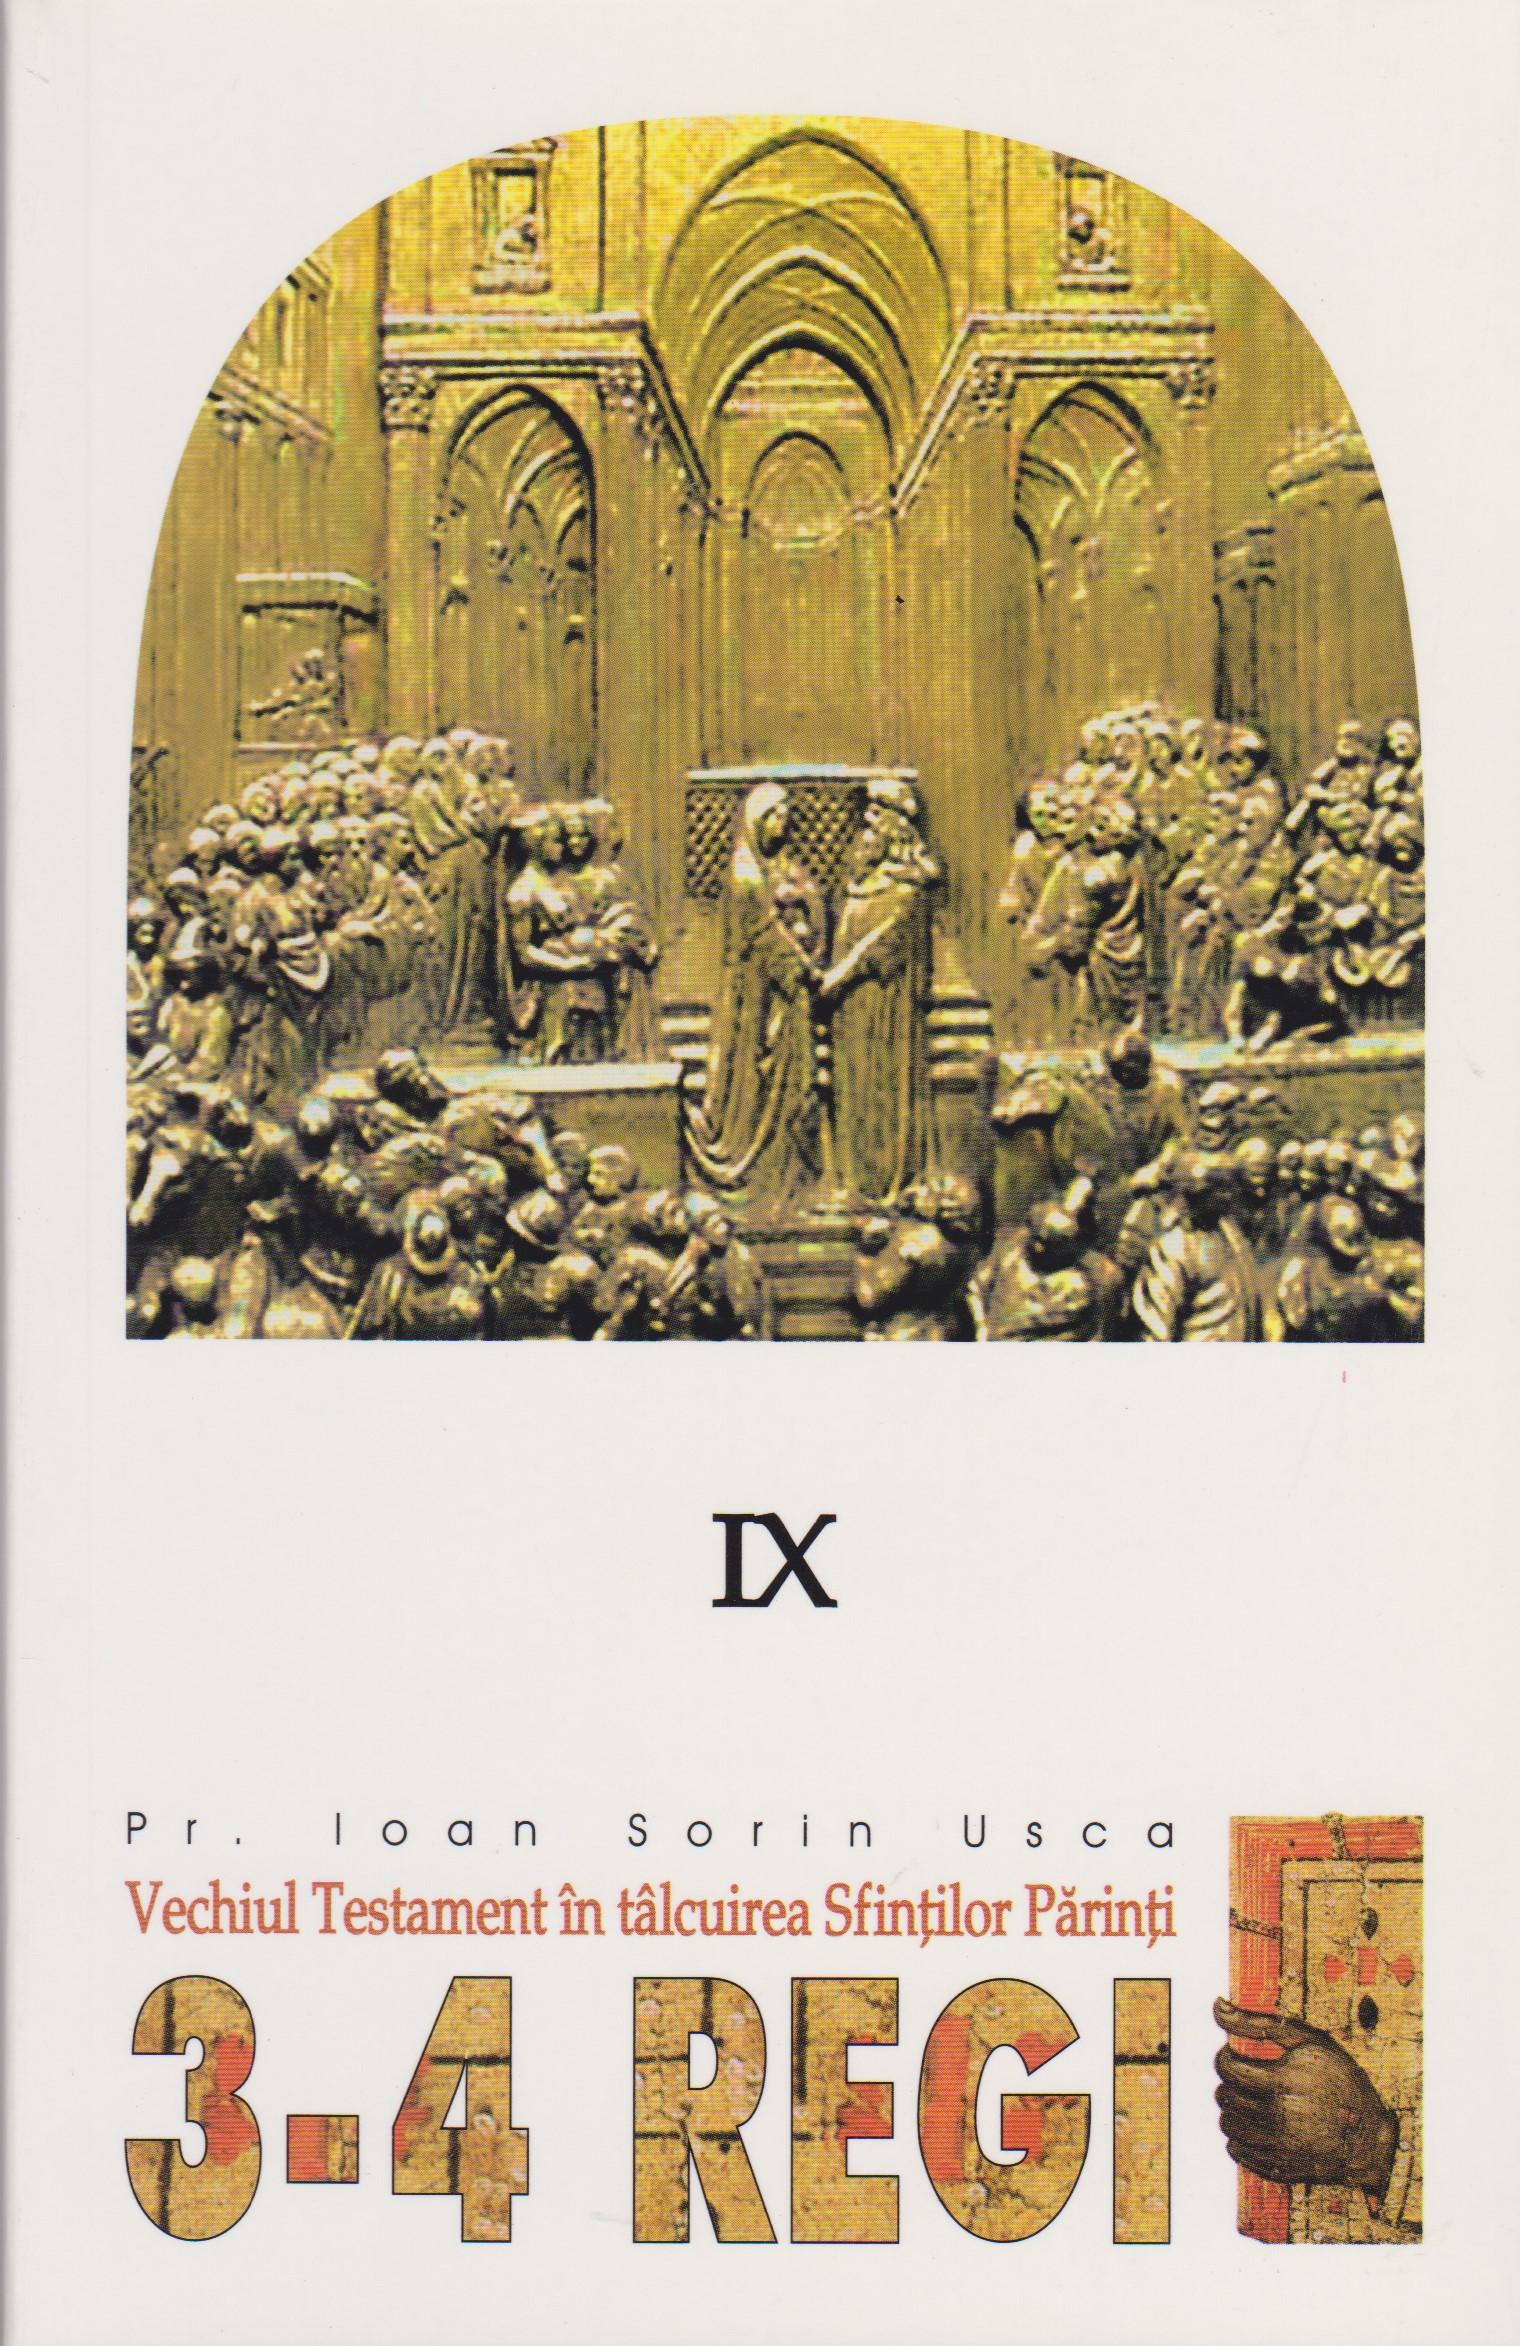 3-4 Regi. Vechiul Testament in talcuirea Sfintilor Parinti